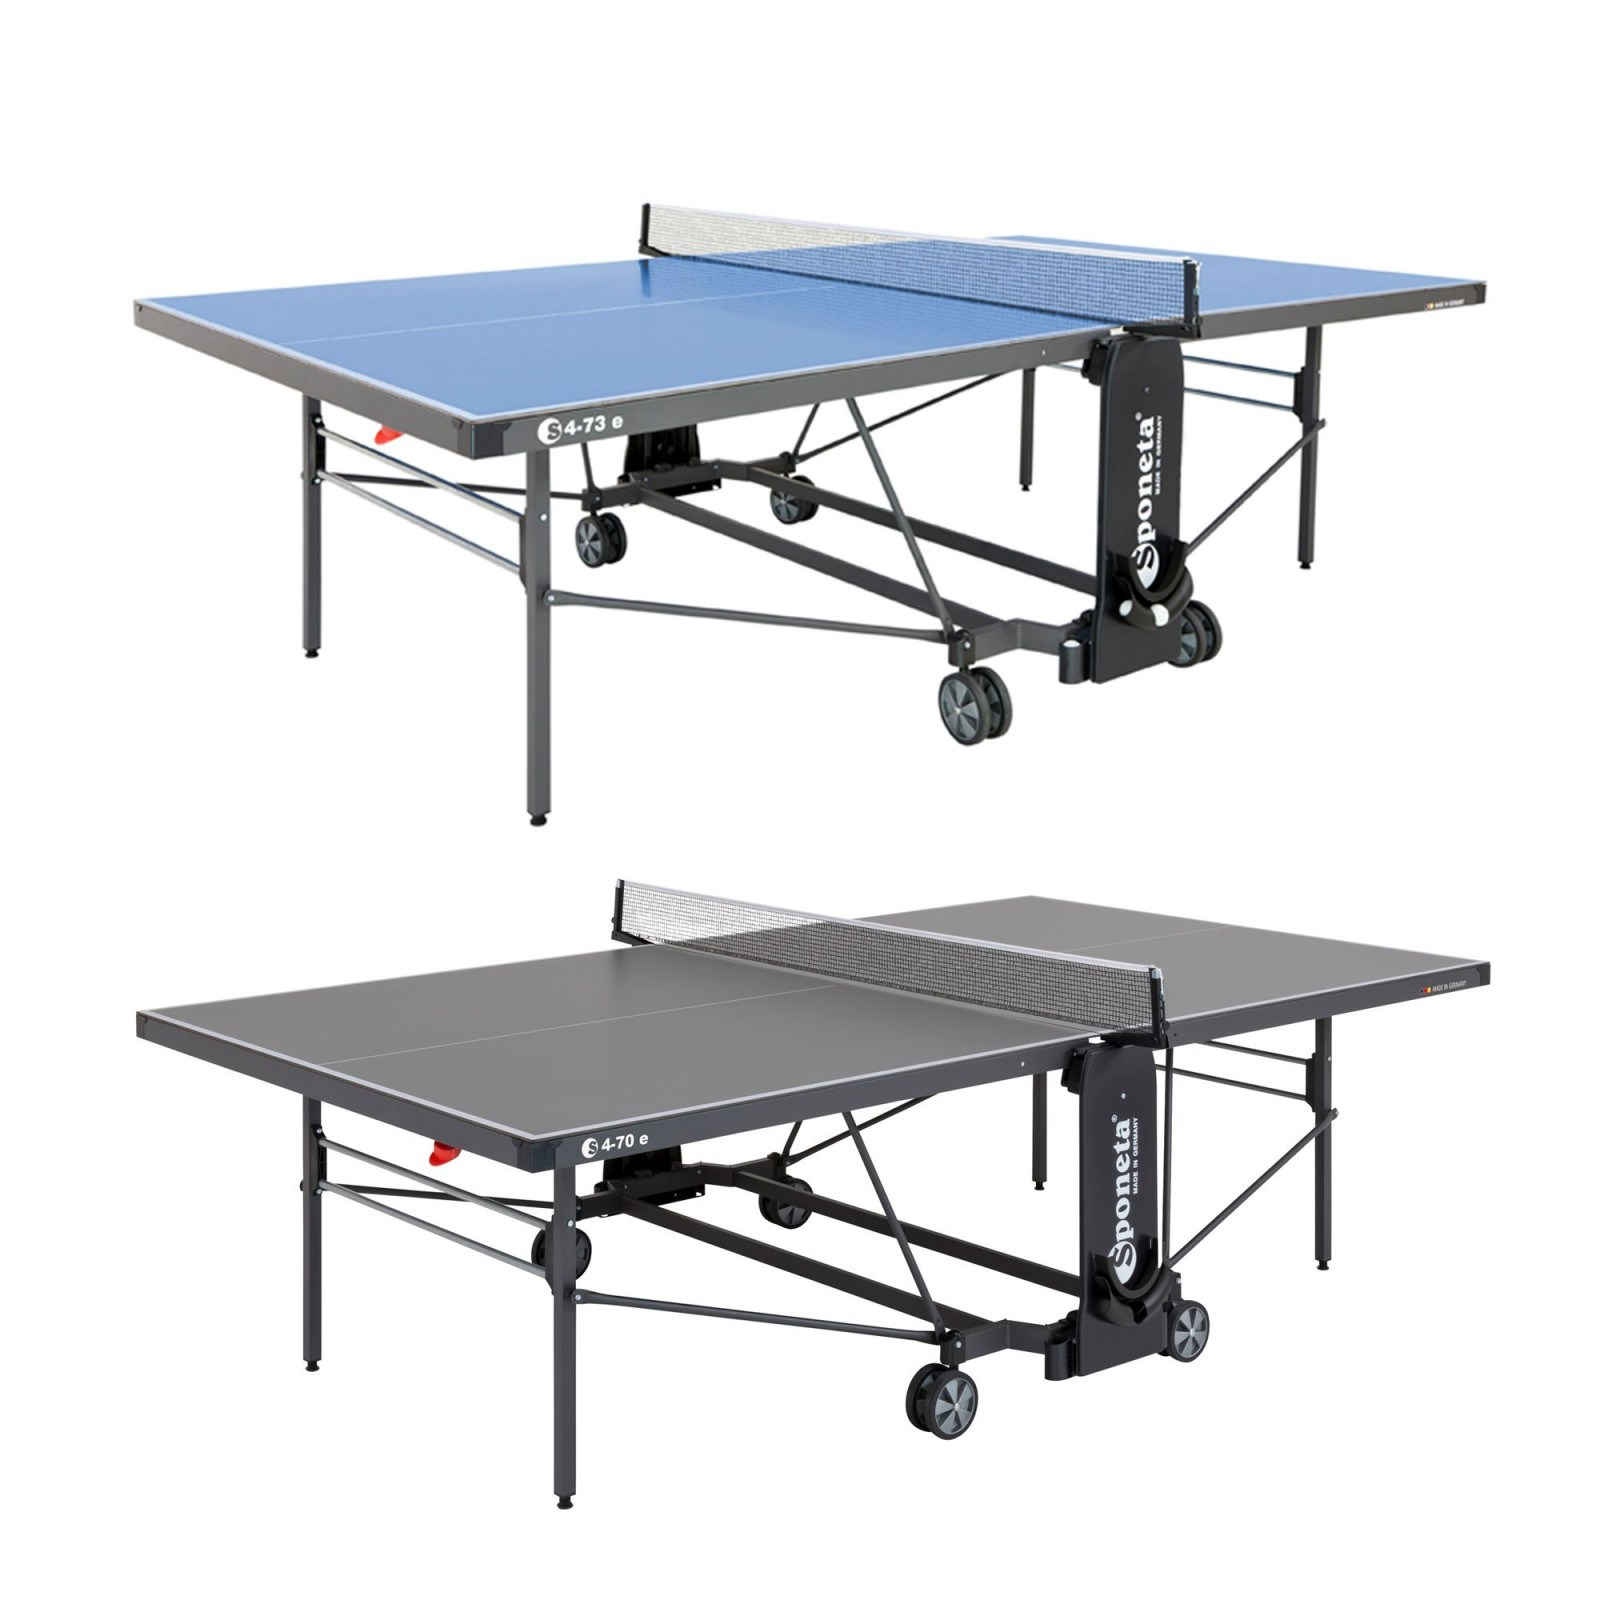 Sponeta table tennis table s4 73e s4 70e sport tiedje - Sponeta table tennis table ...